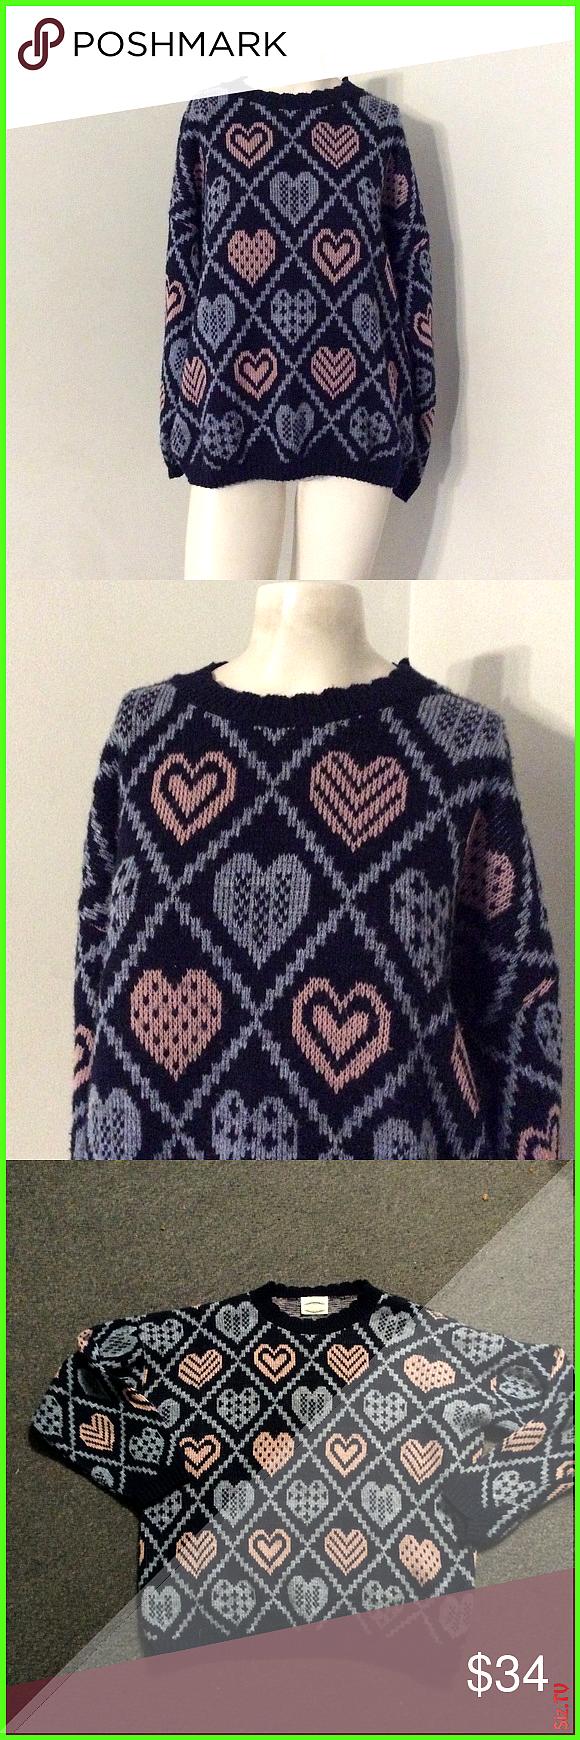 Vintage Kawaii Pastel Fairy Pink Heart Sweater Nice vintage 80s sweater Pastel pink and blue heart